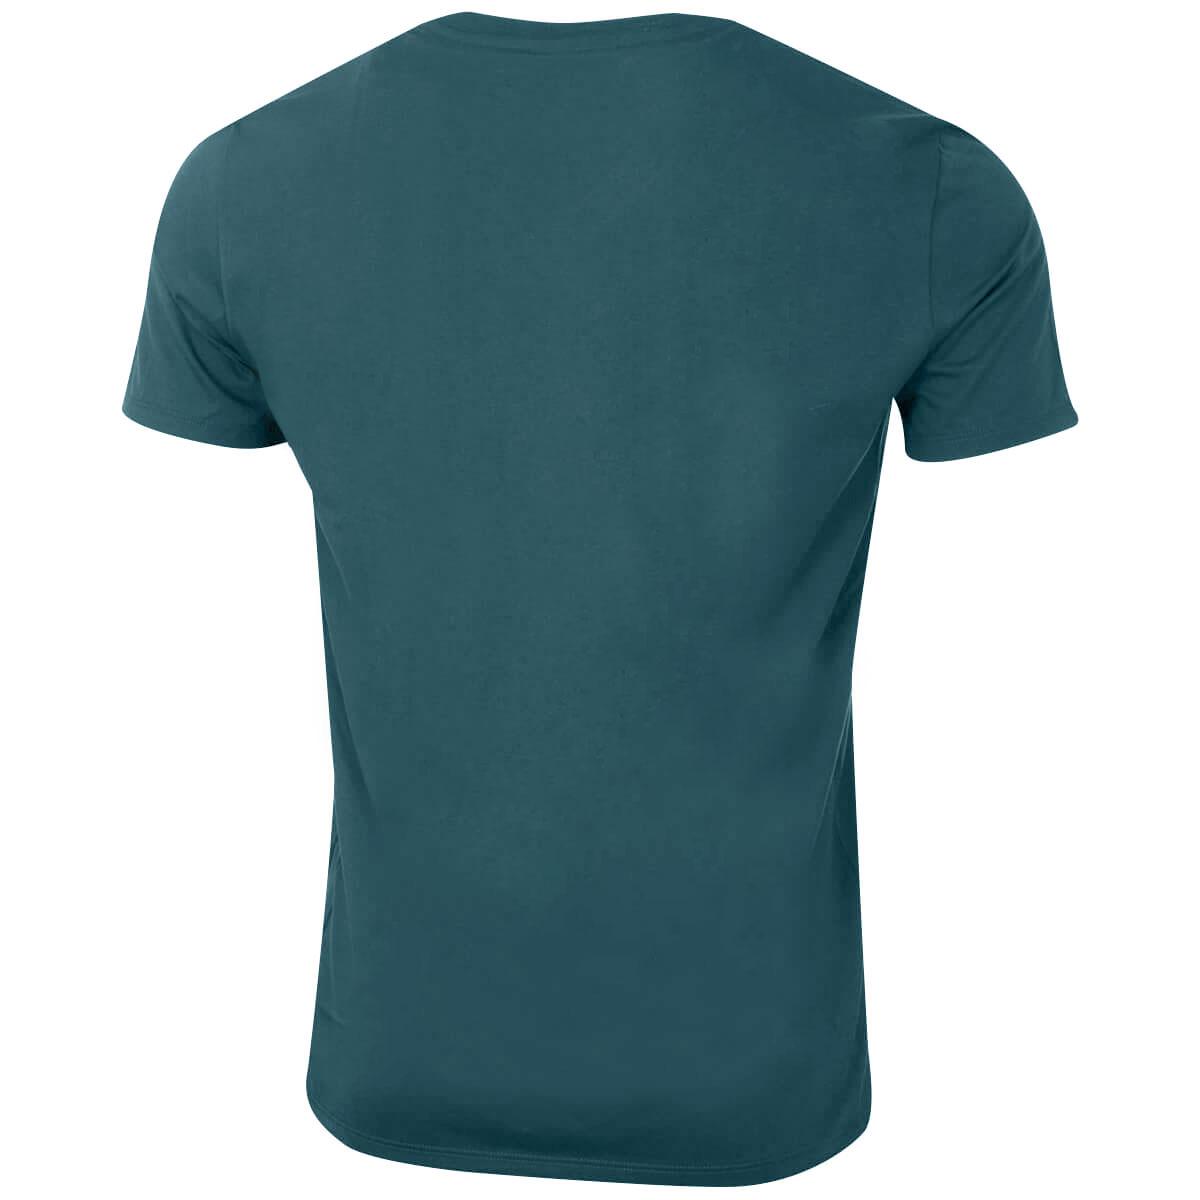 Lacoste-Mens-2019-SS-V-Neck-TH6710-Short-Sleeve-Pima-Cotton-Tee-T-Shirt thumbnail 14